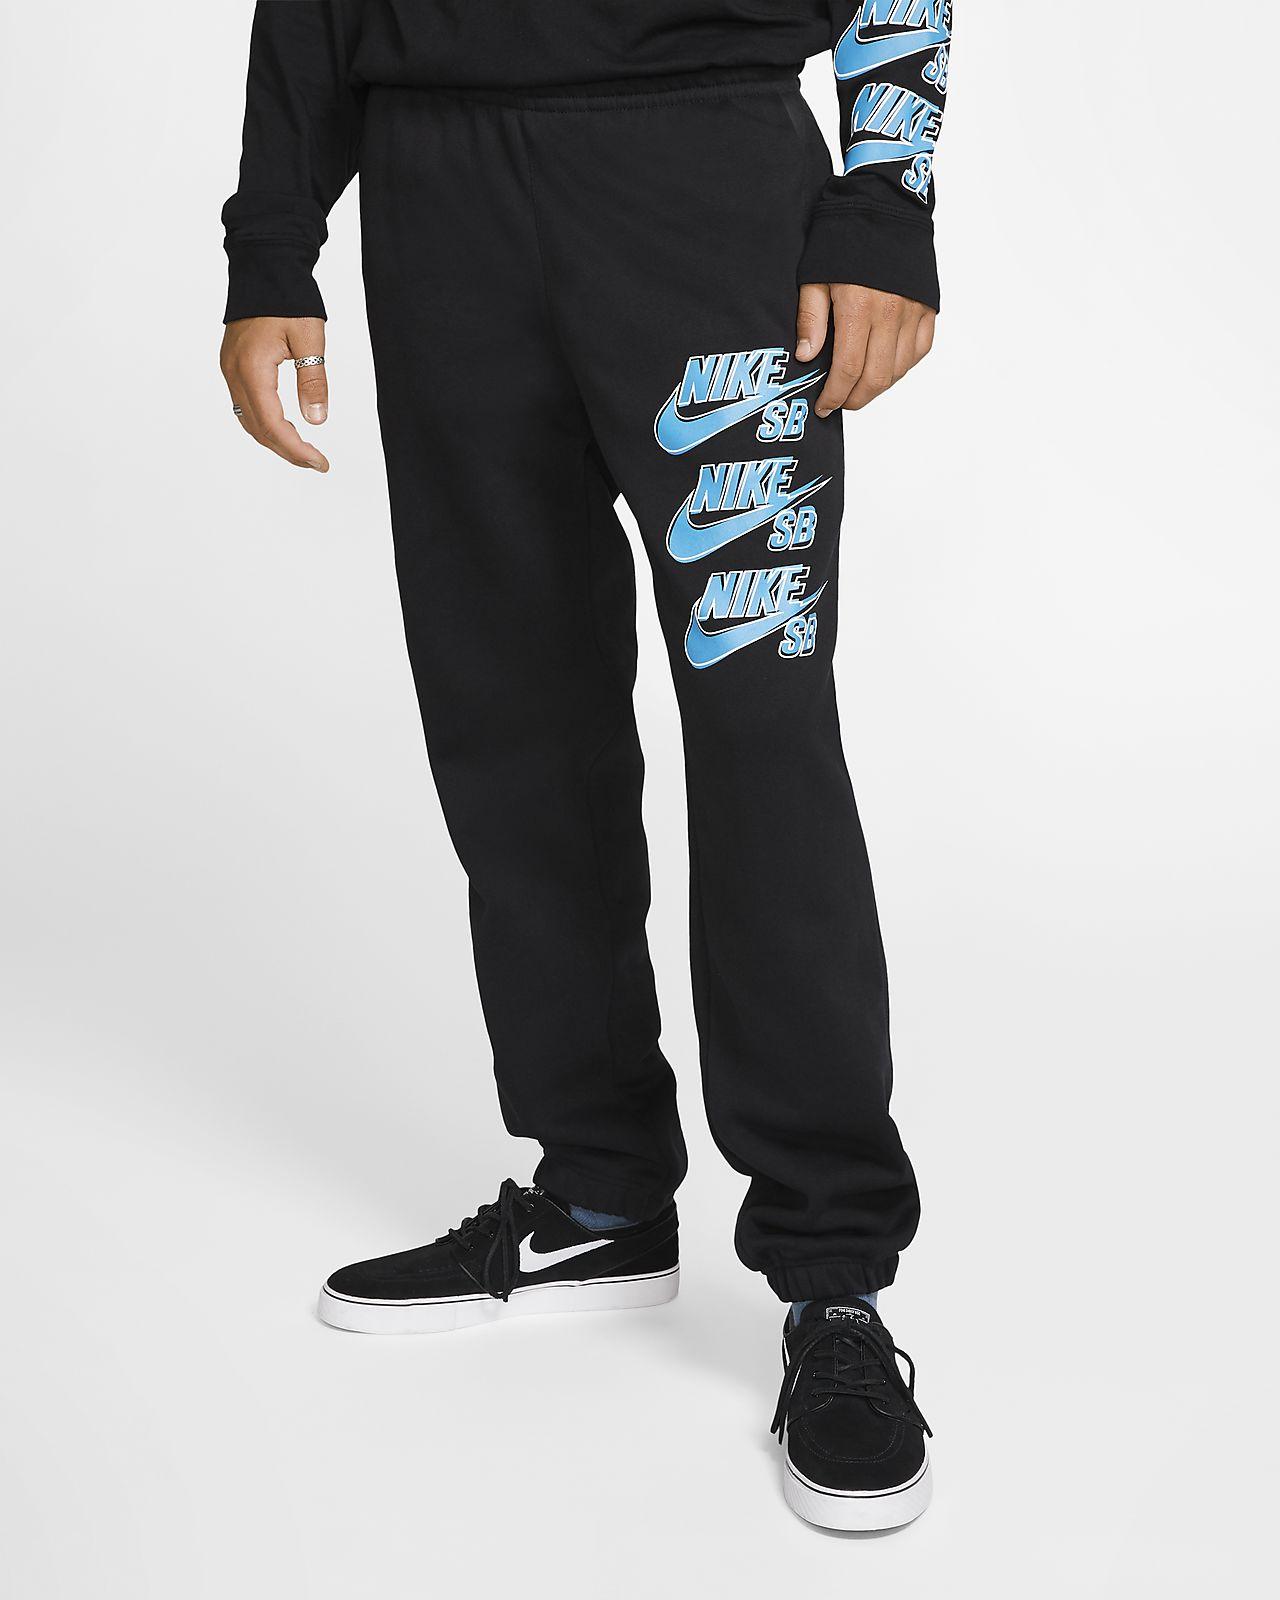 Nike SB Icon Men's Fleece Skate Trousers